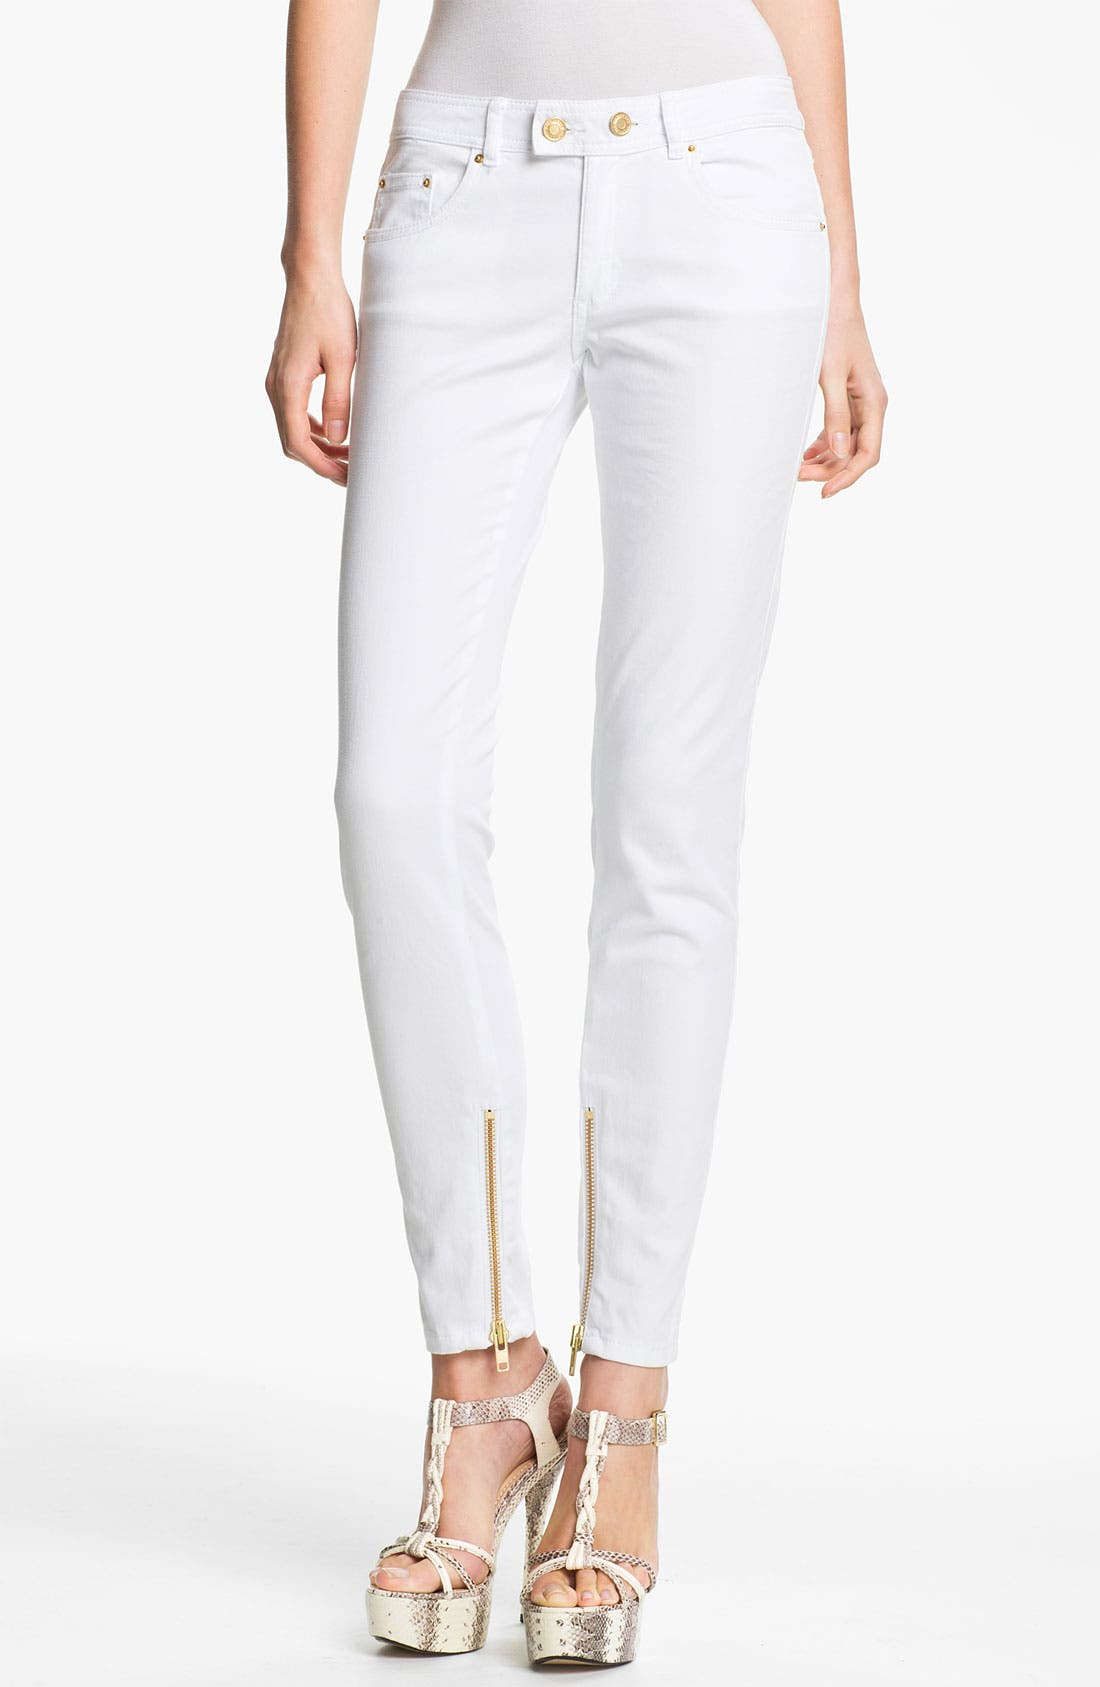 Main Image - Rachel Zoe 'Julie' Zip Detail Skinny Stretch Jeans